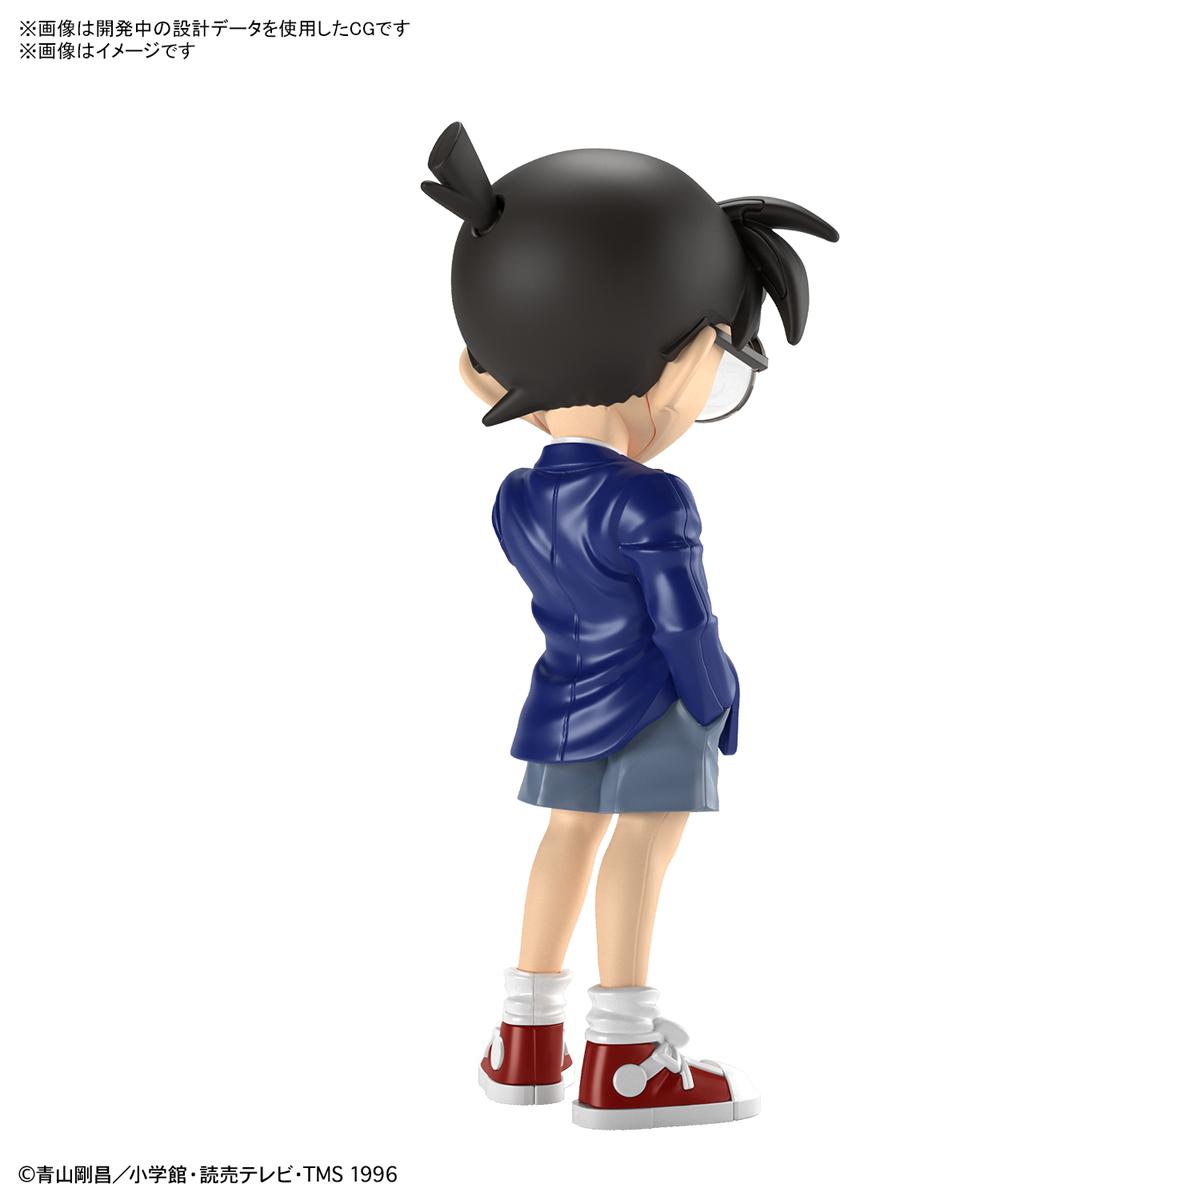 ENTRY GRADE『江戸川コナン』名探偵コナン プラモデル-002